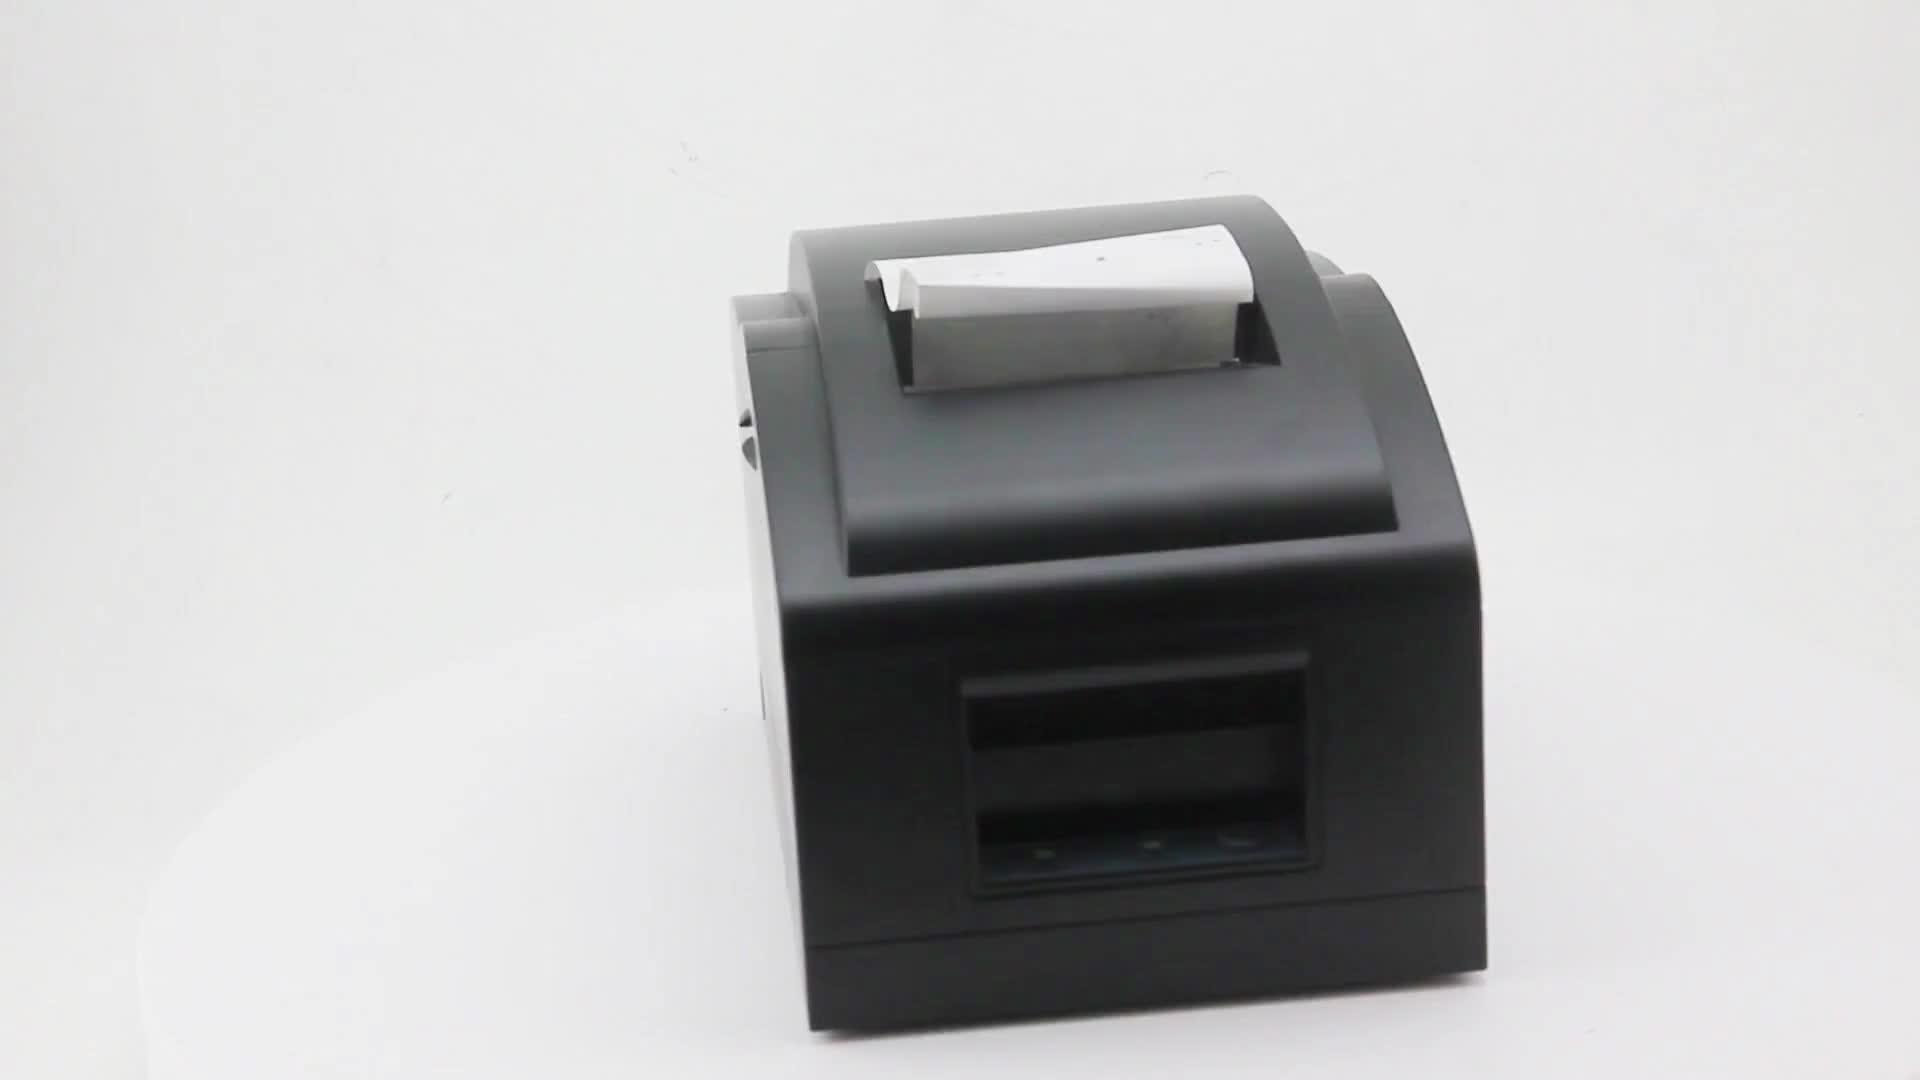 76mm dot matrix impact printer easy paper loading high printing/high performance easy printer with double color printing